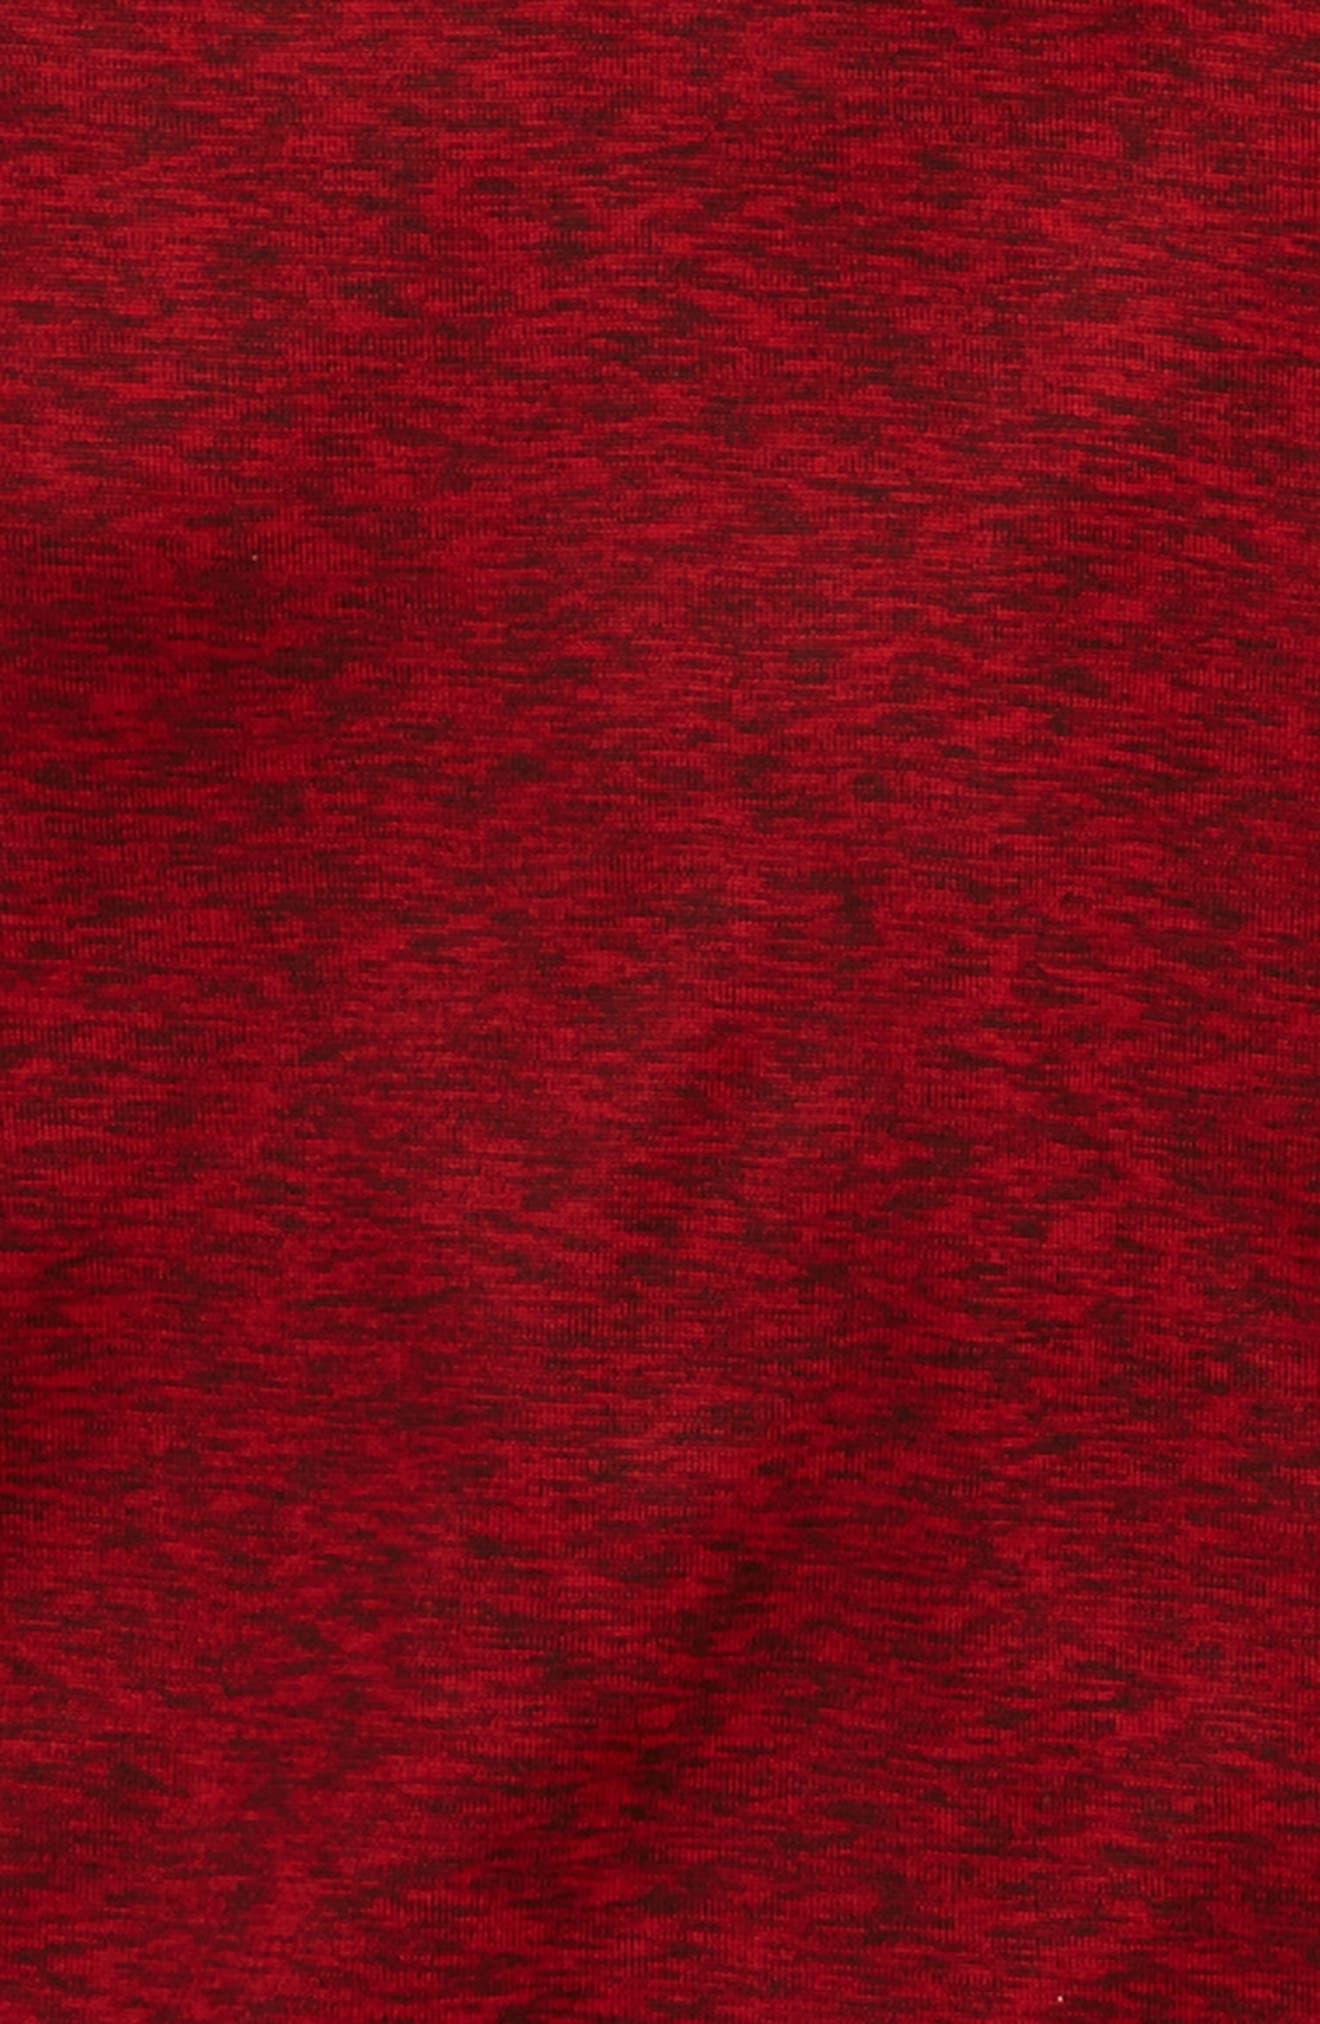 Jordan Dri-FIT Hooded T-Shirt,                             Alternate thumbnail 2, color,                             606